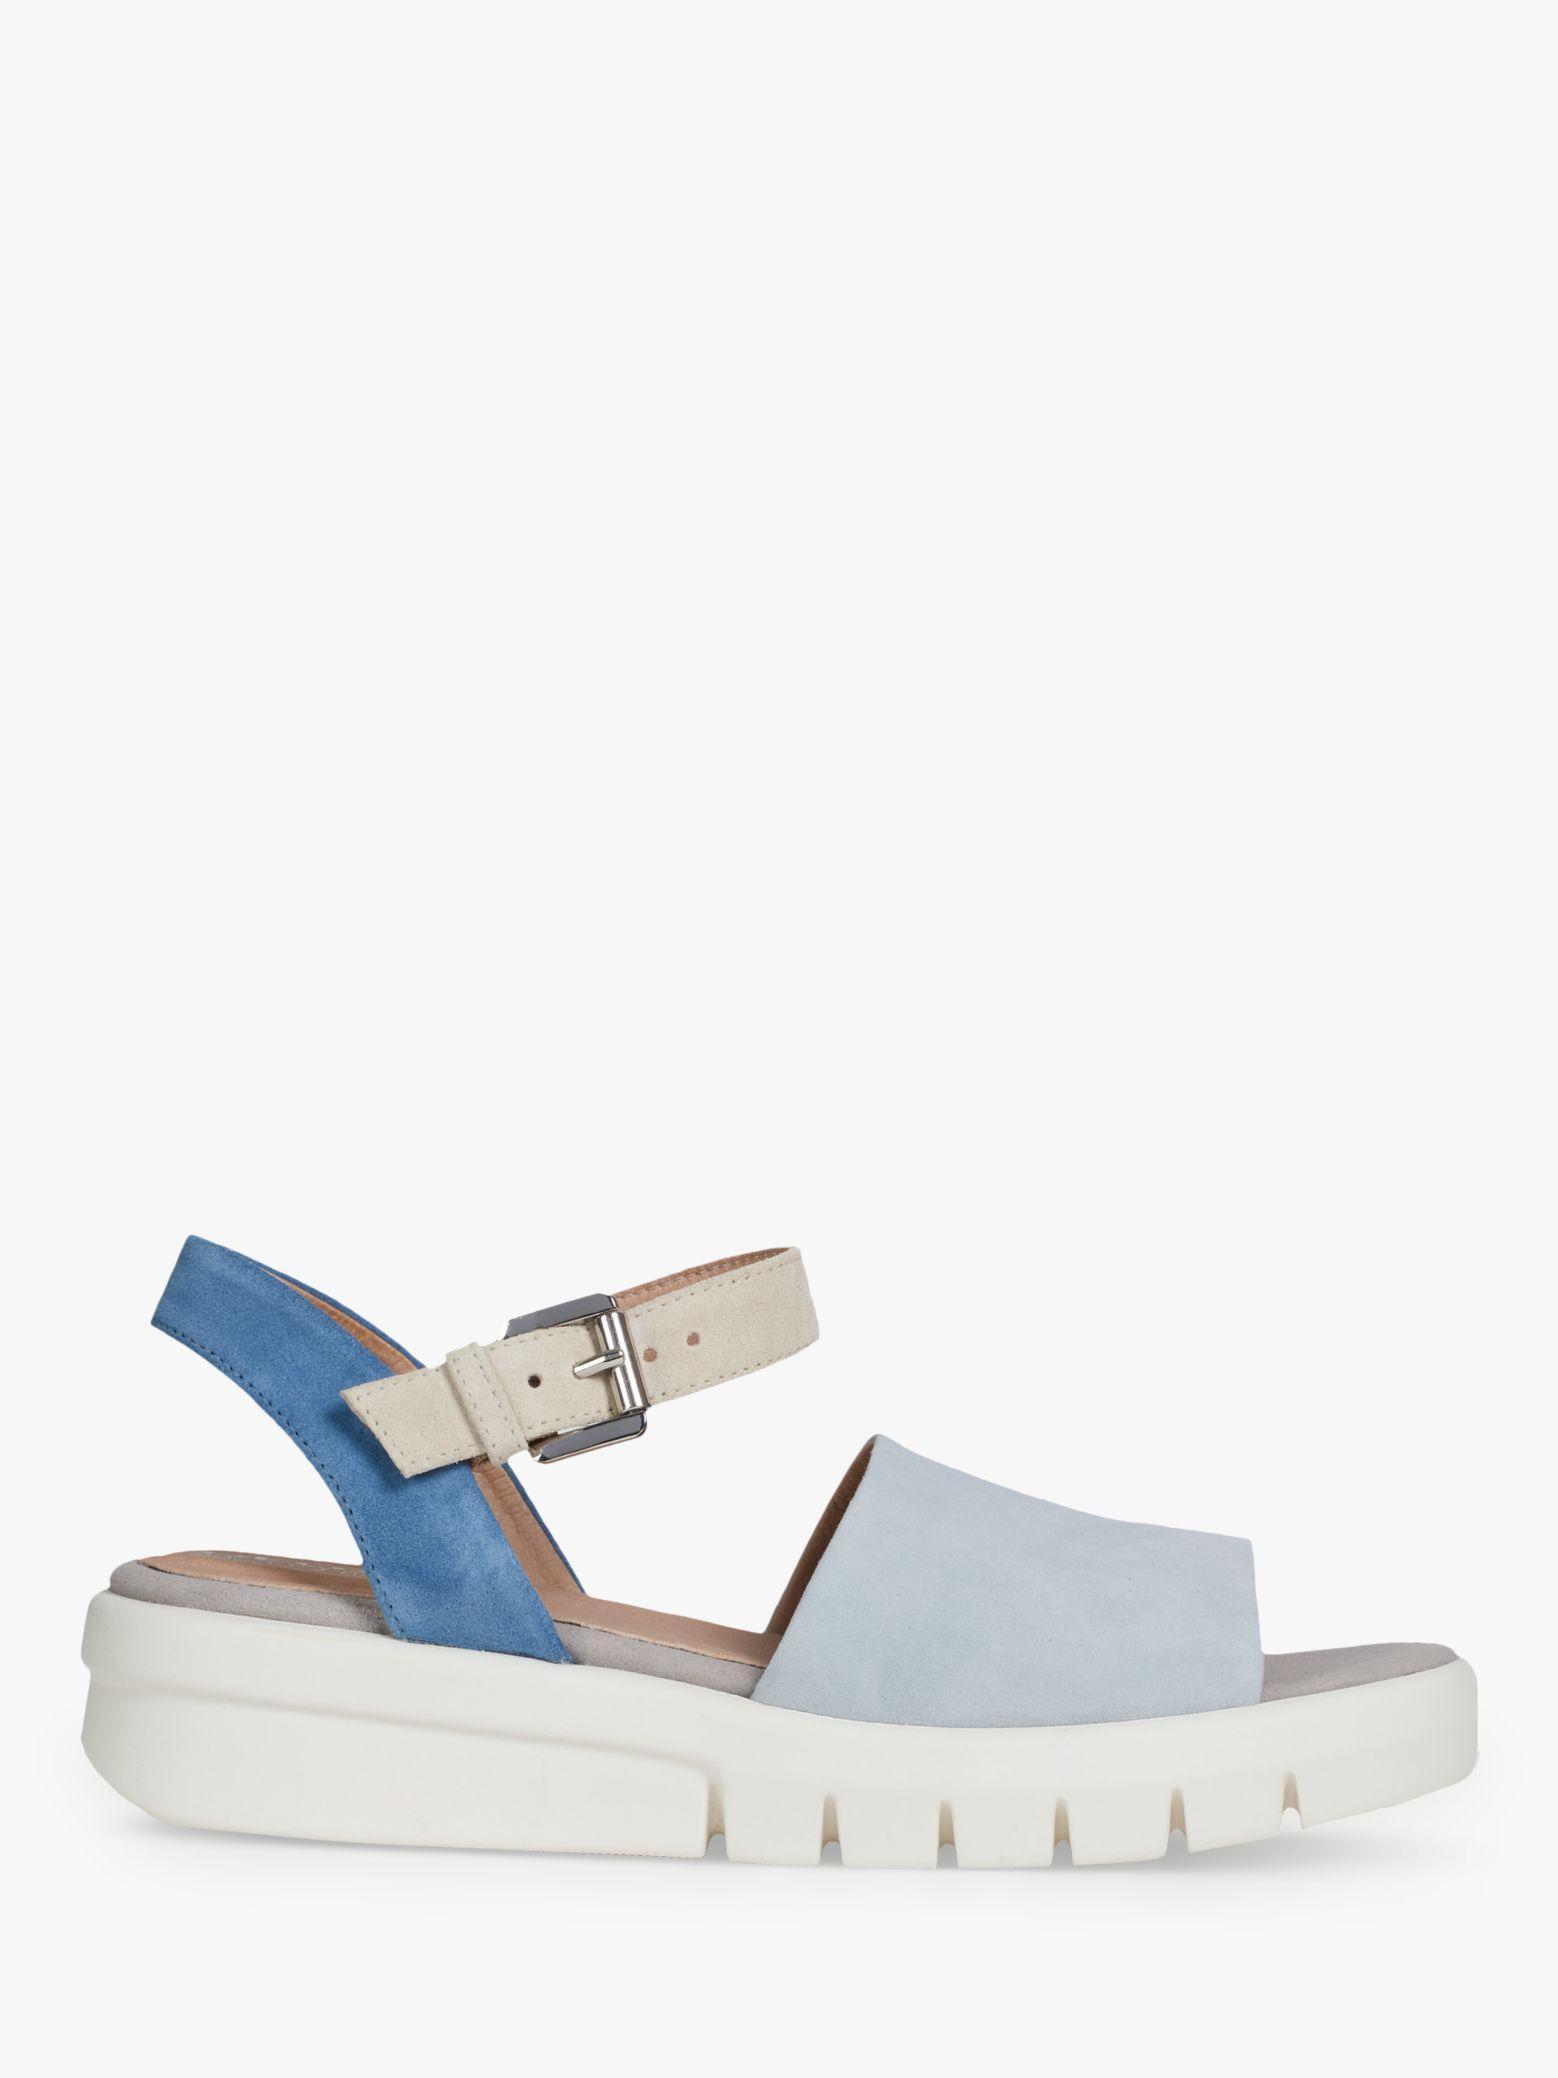 12738bd0979 Geox Women's Wimbley Flatform Sandals in Blue - Lyst